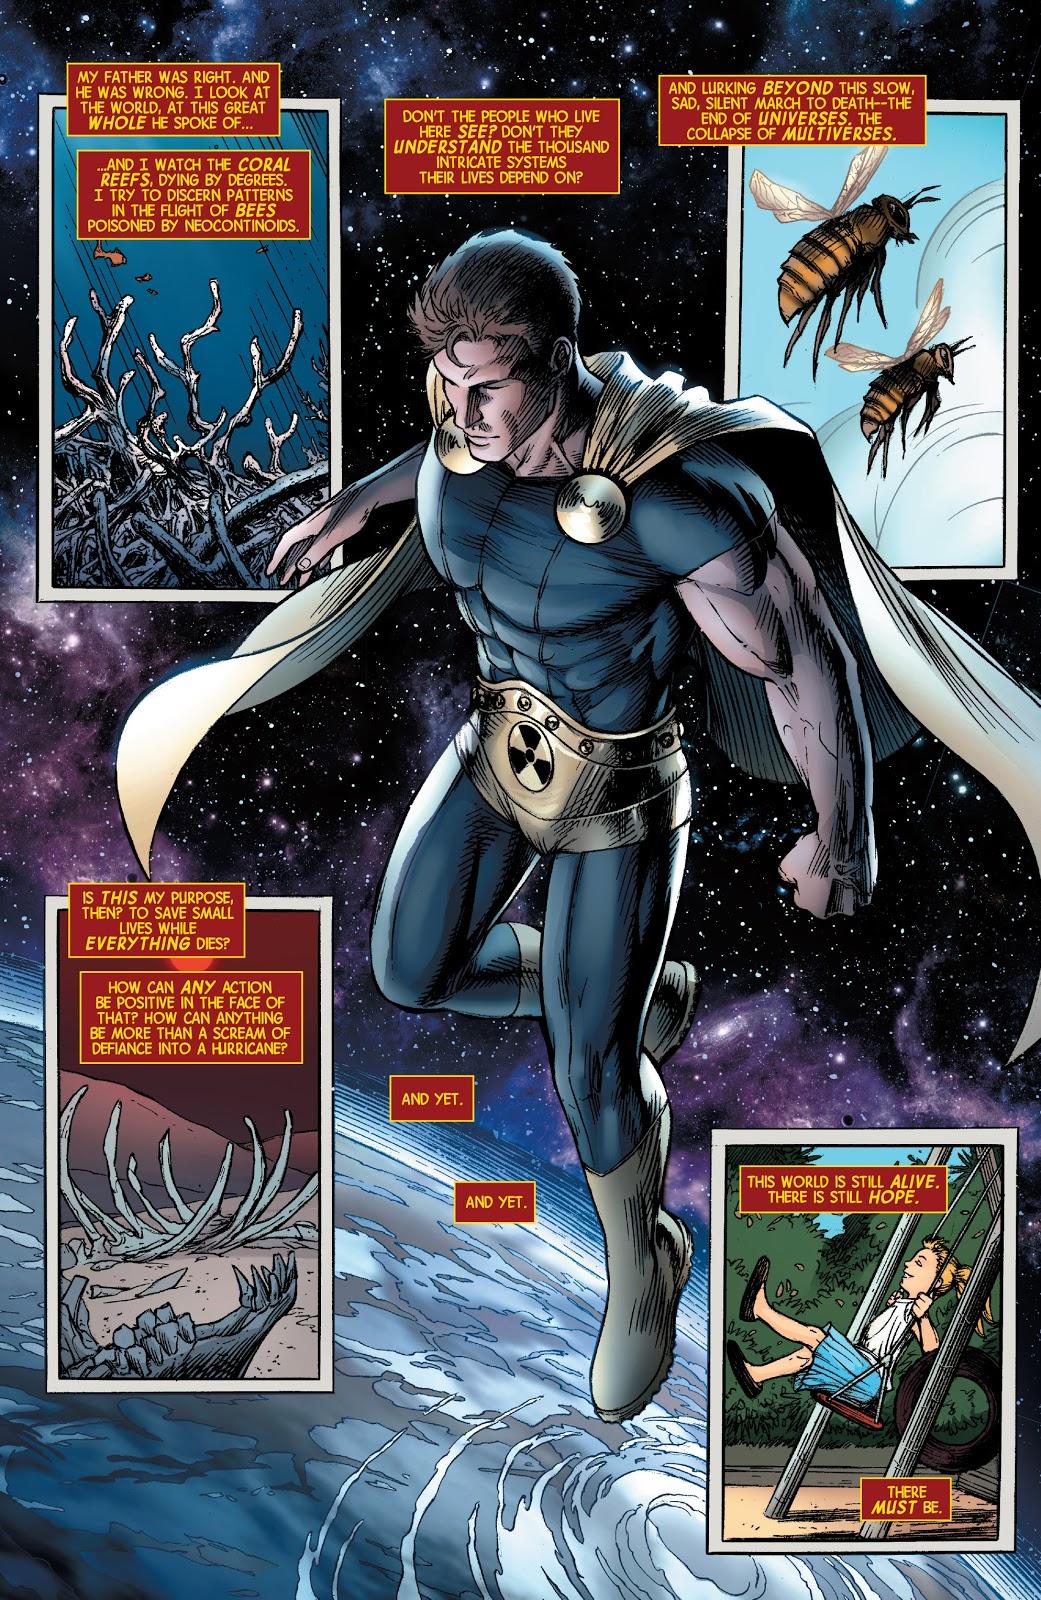 Enhanced Vision | Superpower Wiki | FANDOM powered by Wikia